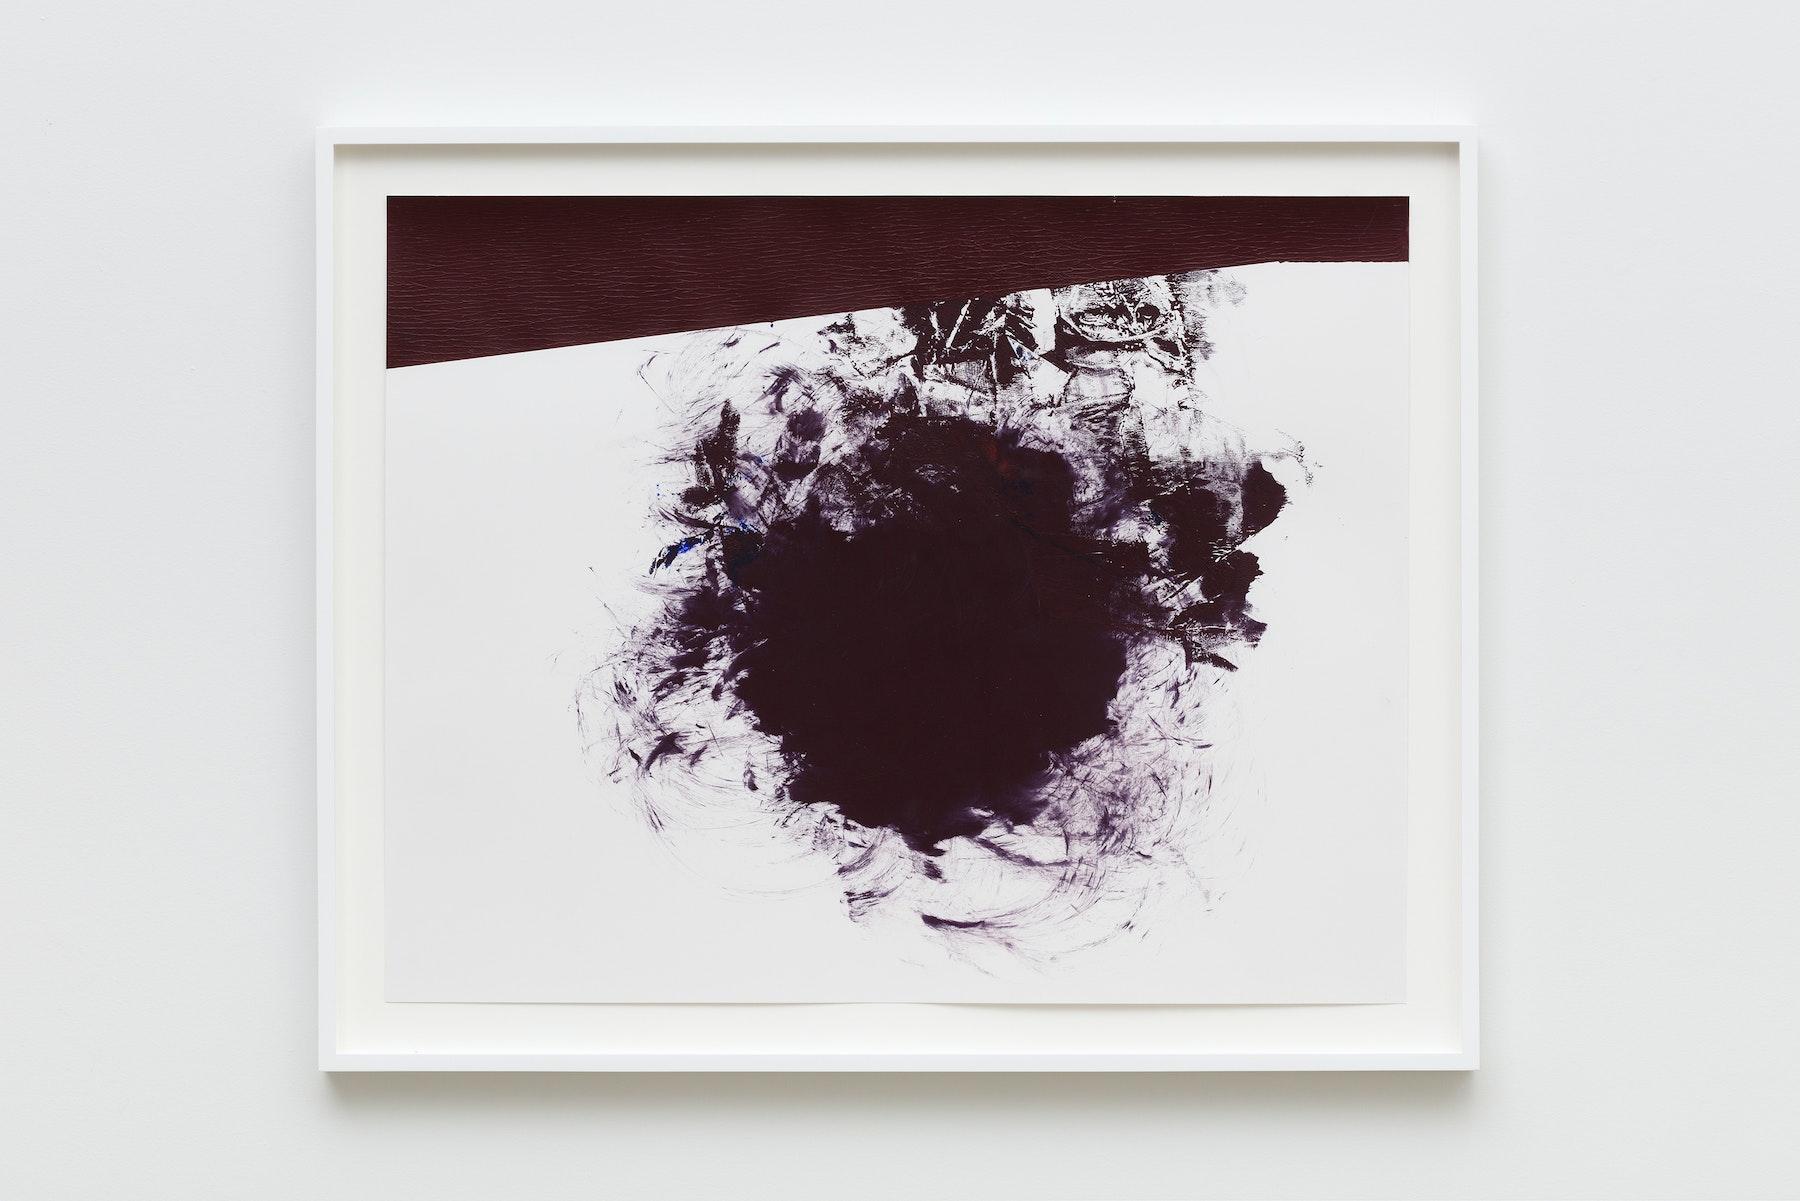 "Elizabeth Neel ""US 4,"" 2019 Acrylic on paper 22.5 x 28.5"" [HxW] (57.15 x 72.39 cm) Inventory #NEE246 Courtesy of the artist and Vielmetter Los Angeles Photo credit: Jeff McLane"